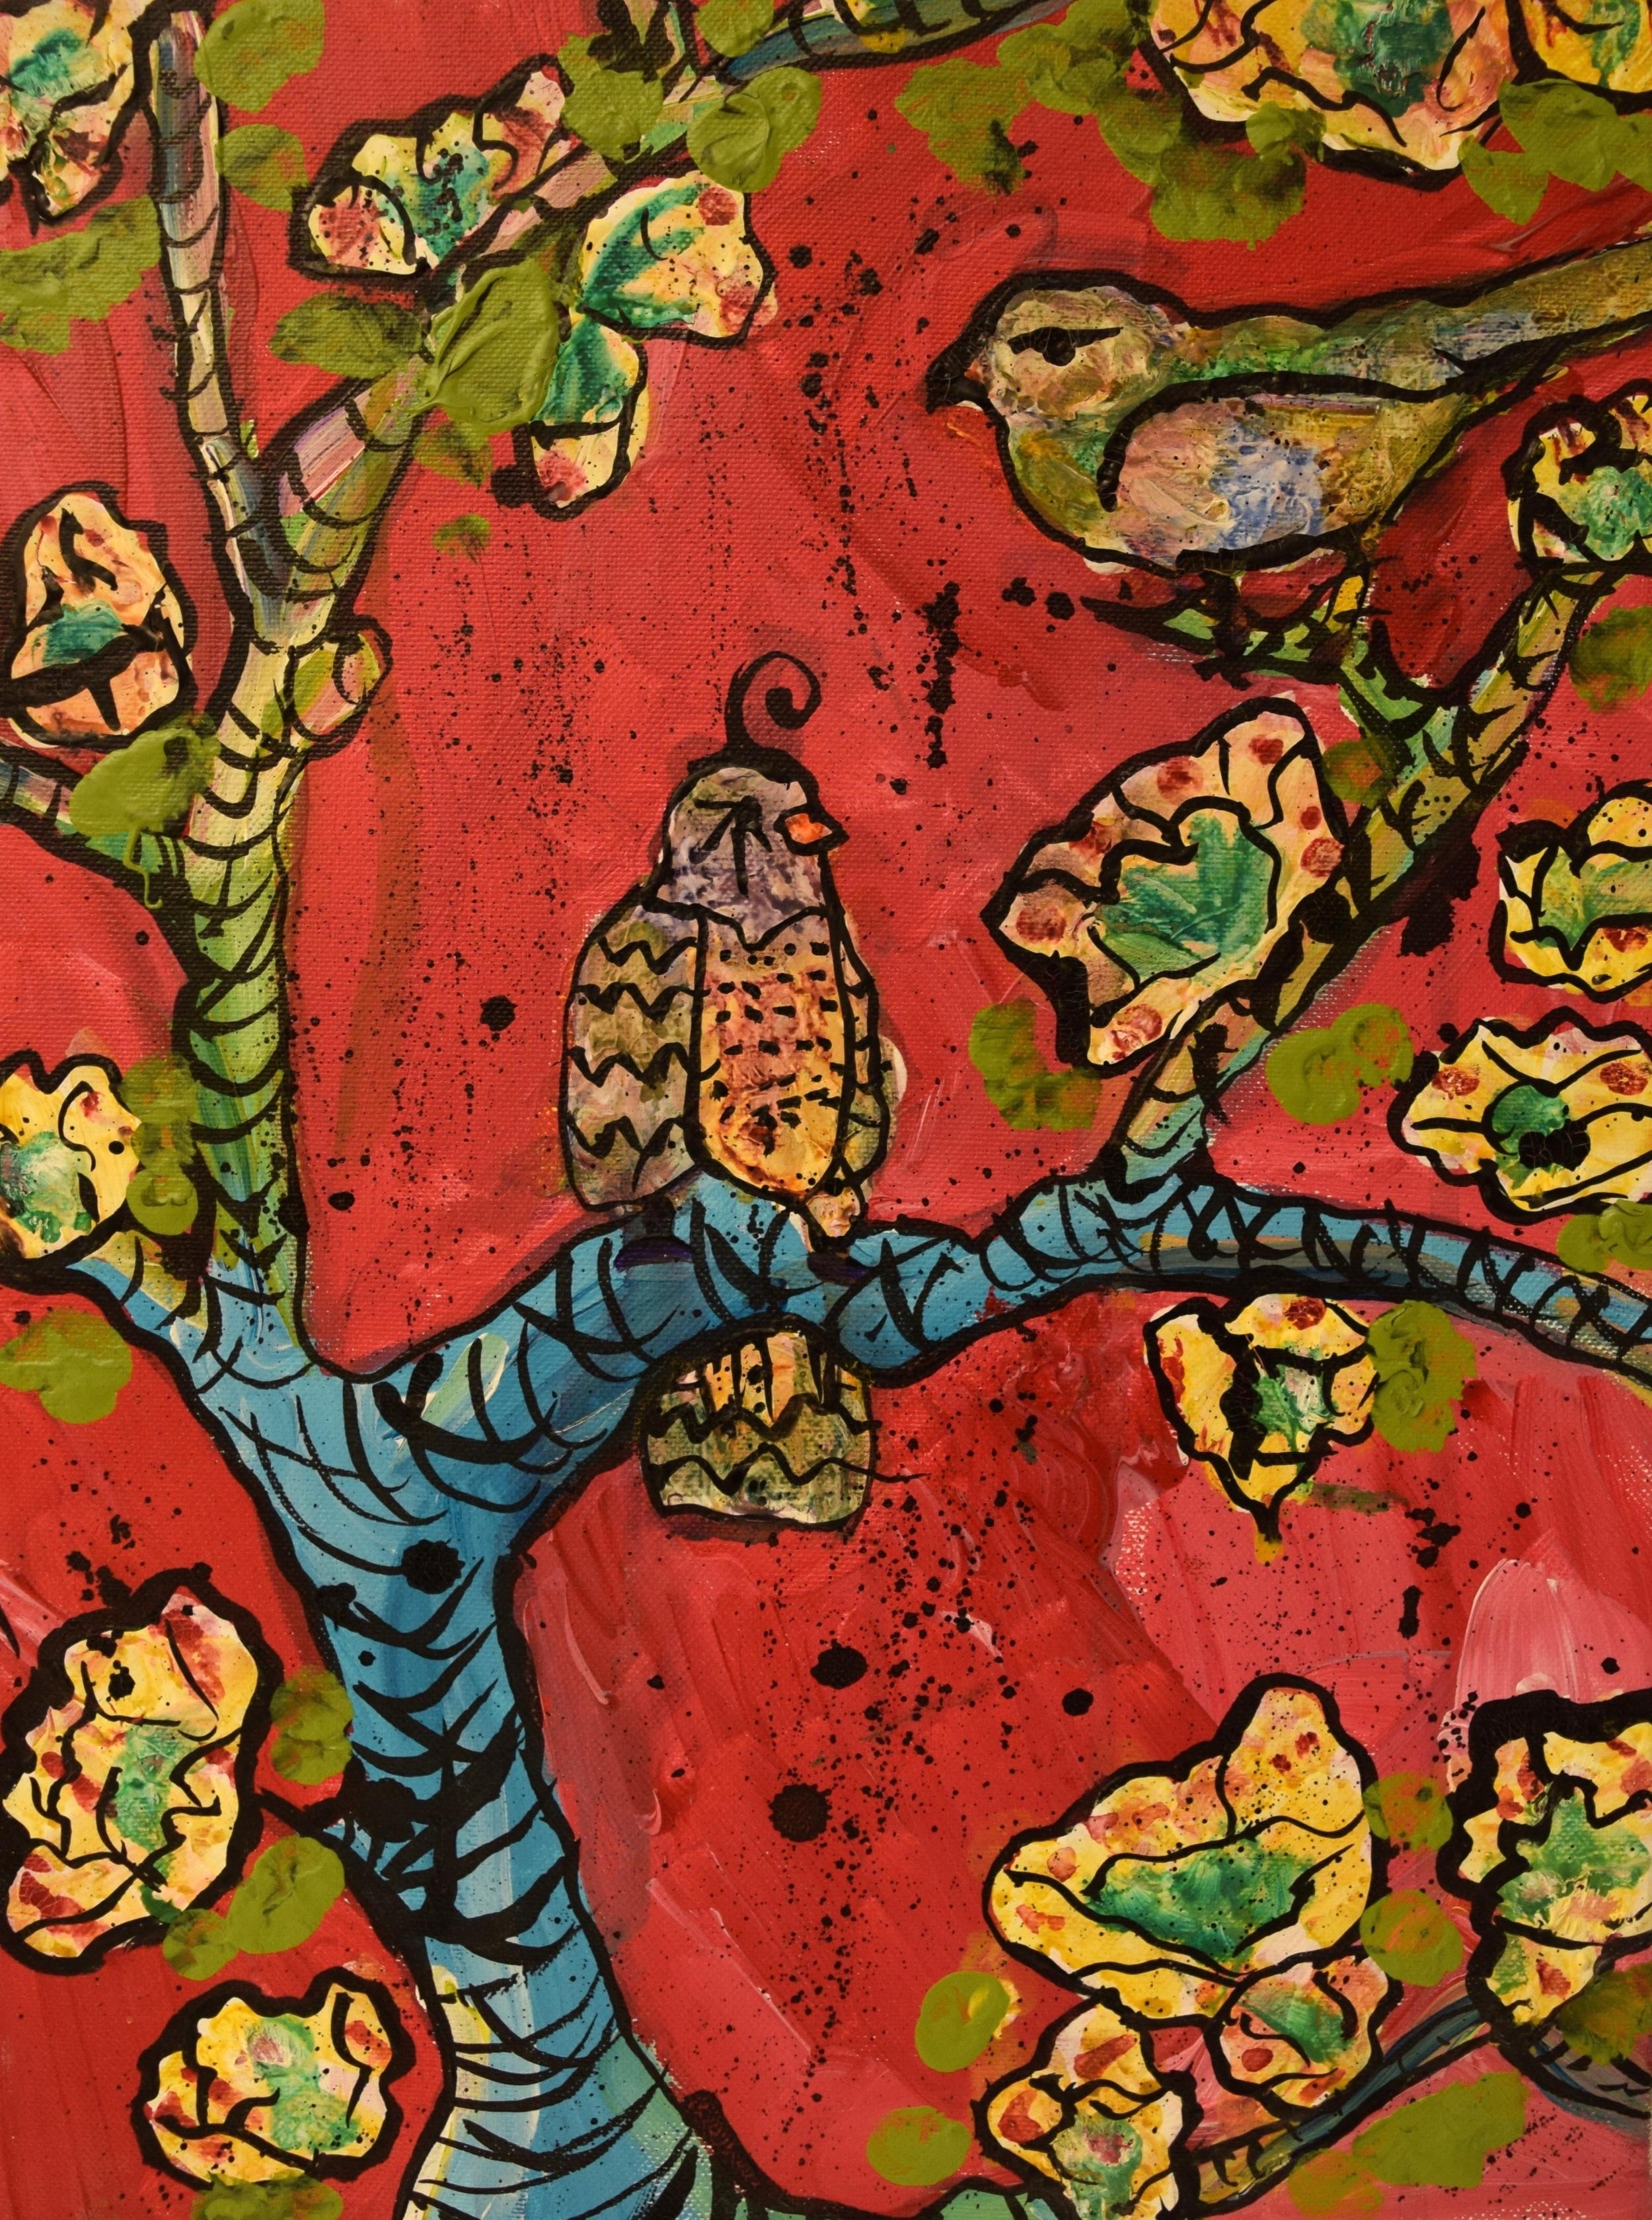 "Birds/ Mixed Media on Canvas/ 12x16""/ July 2012"